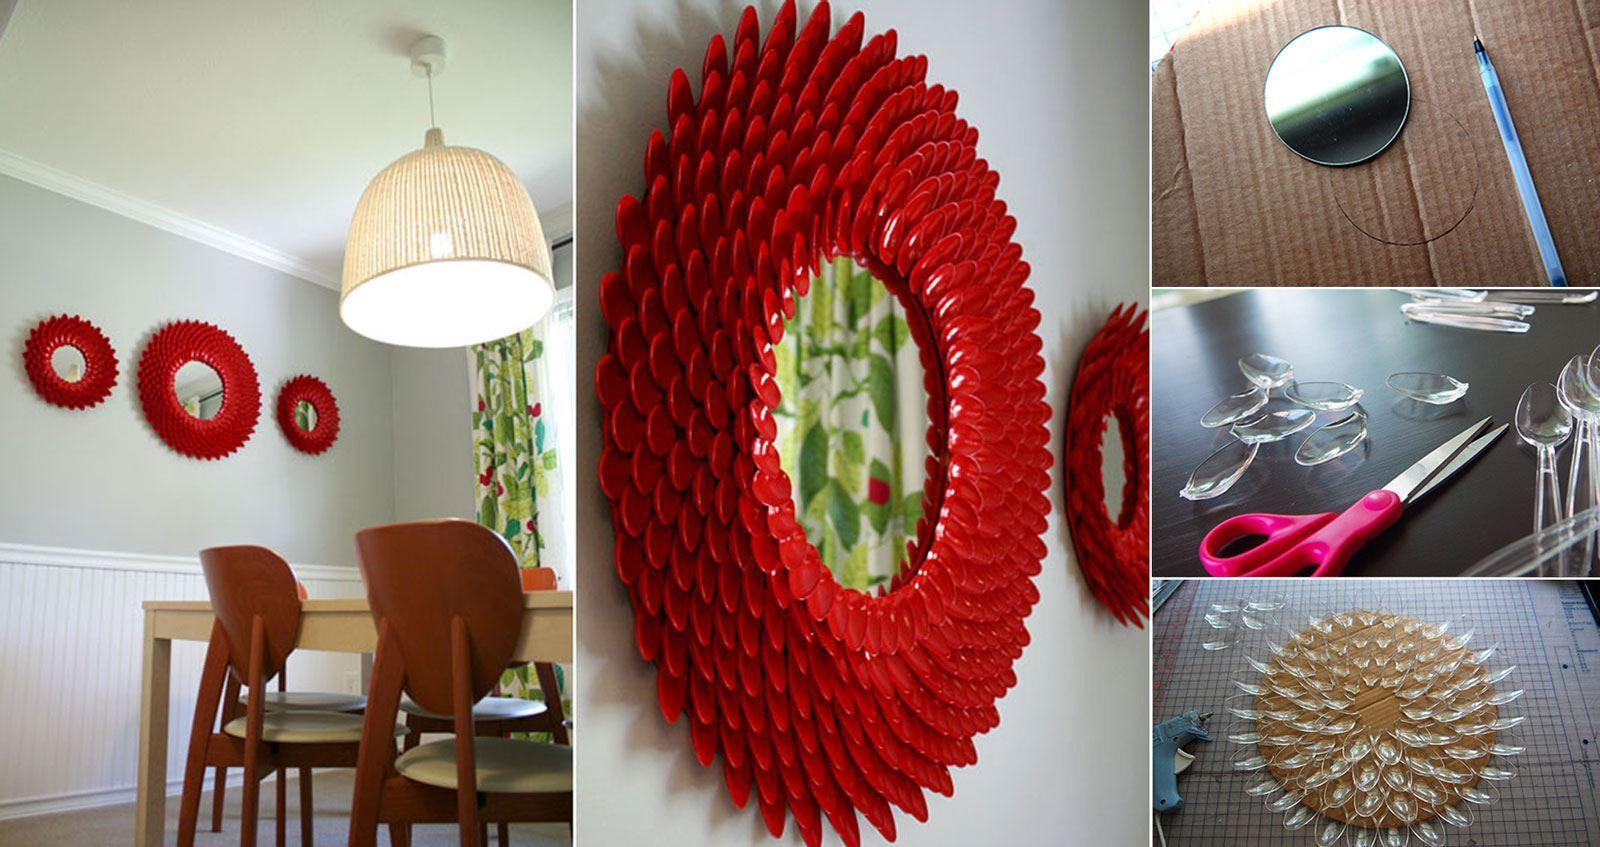 Diy plastic spoon chrysanthemum mirror diy projects for Diy plastic